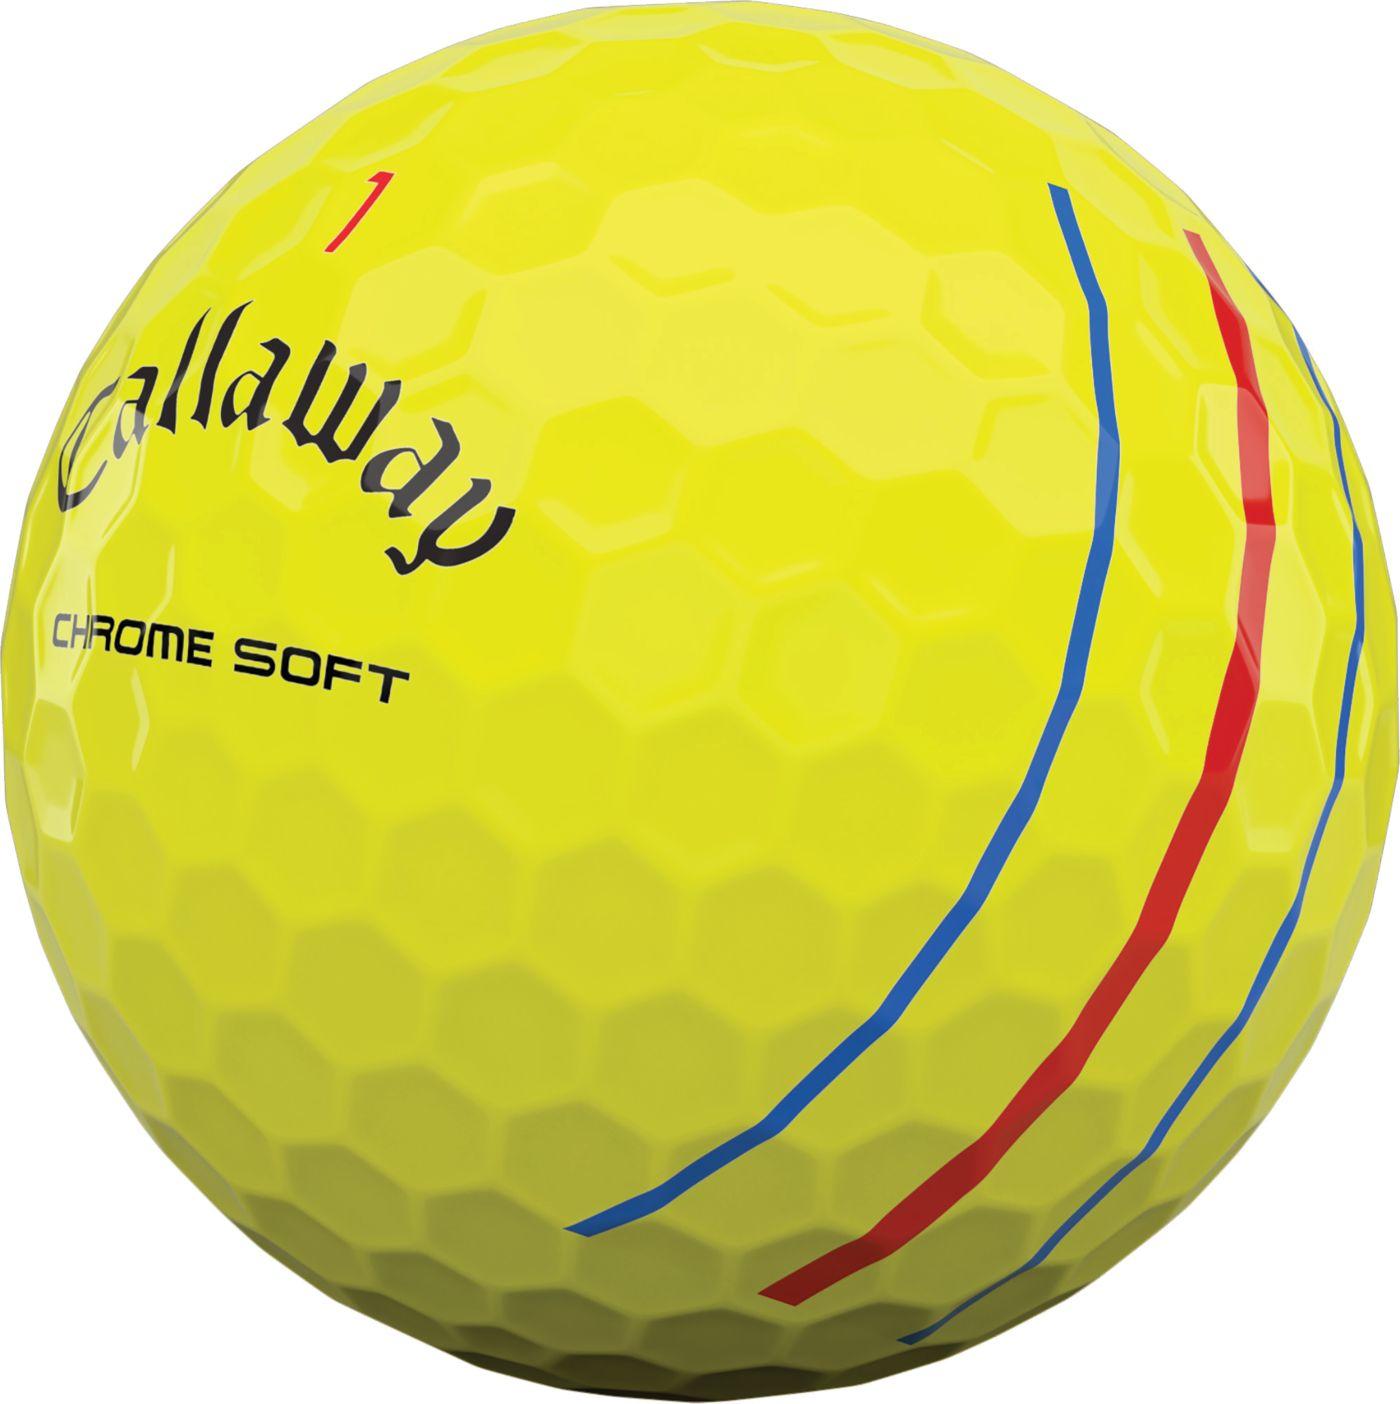 Callaway 2020 Chrome Soft Triple Track Yellow Golf Balls